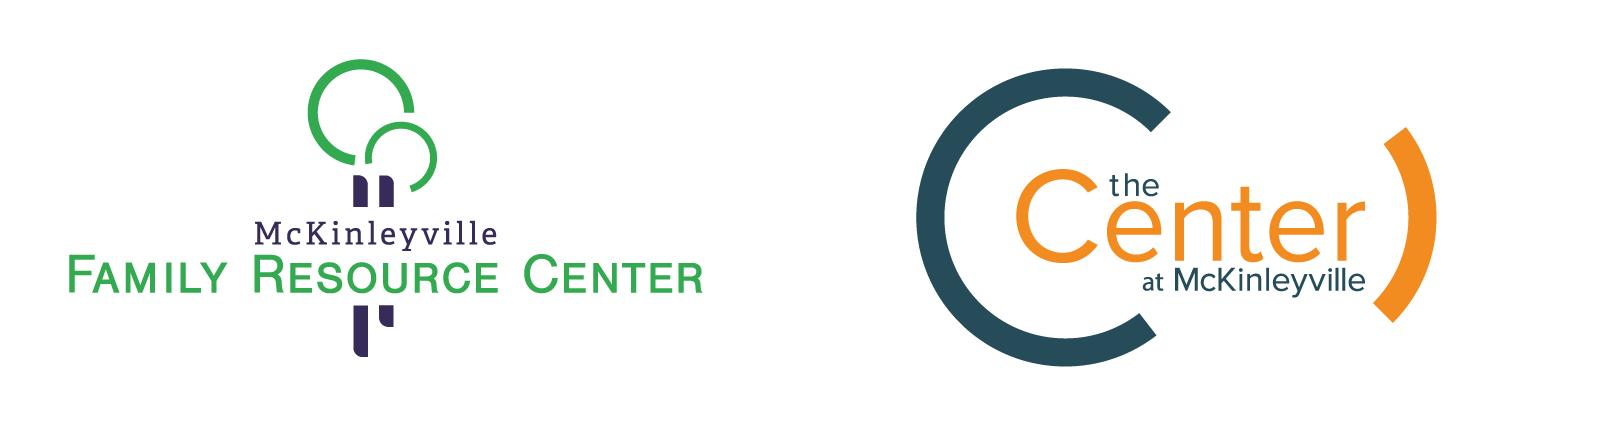 McKinleyville Family Resource Center and The Center Logos